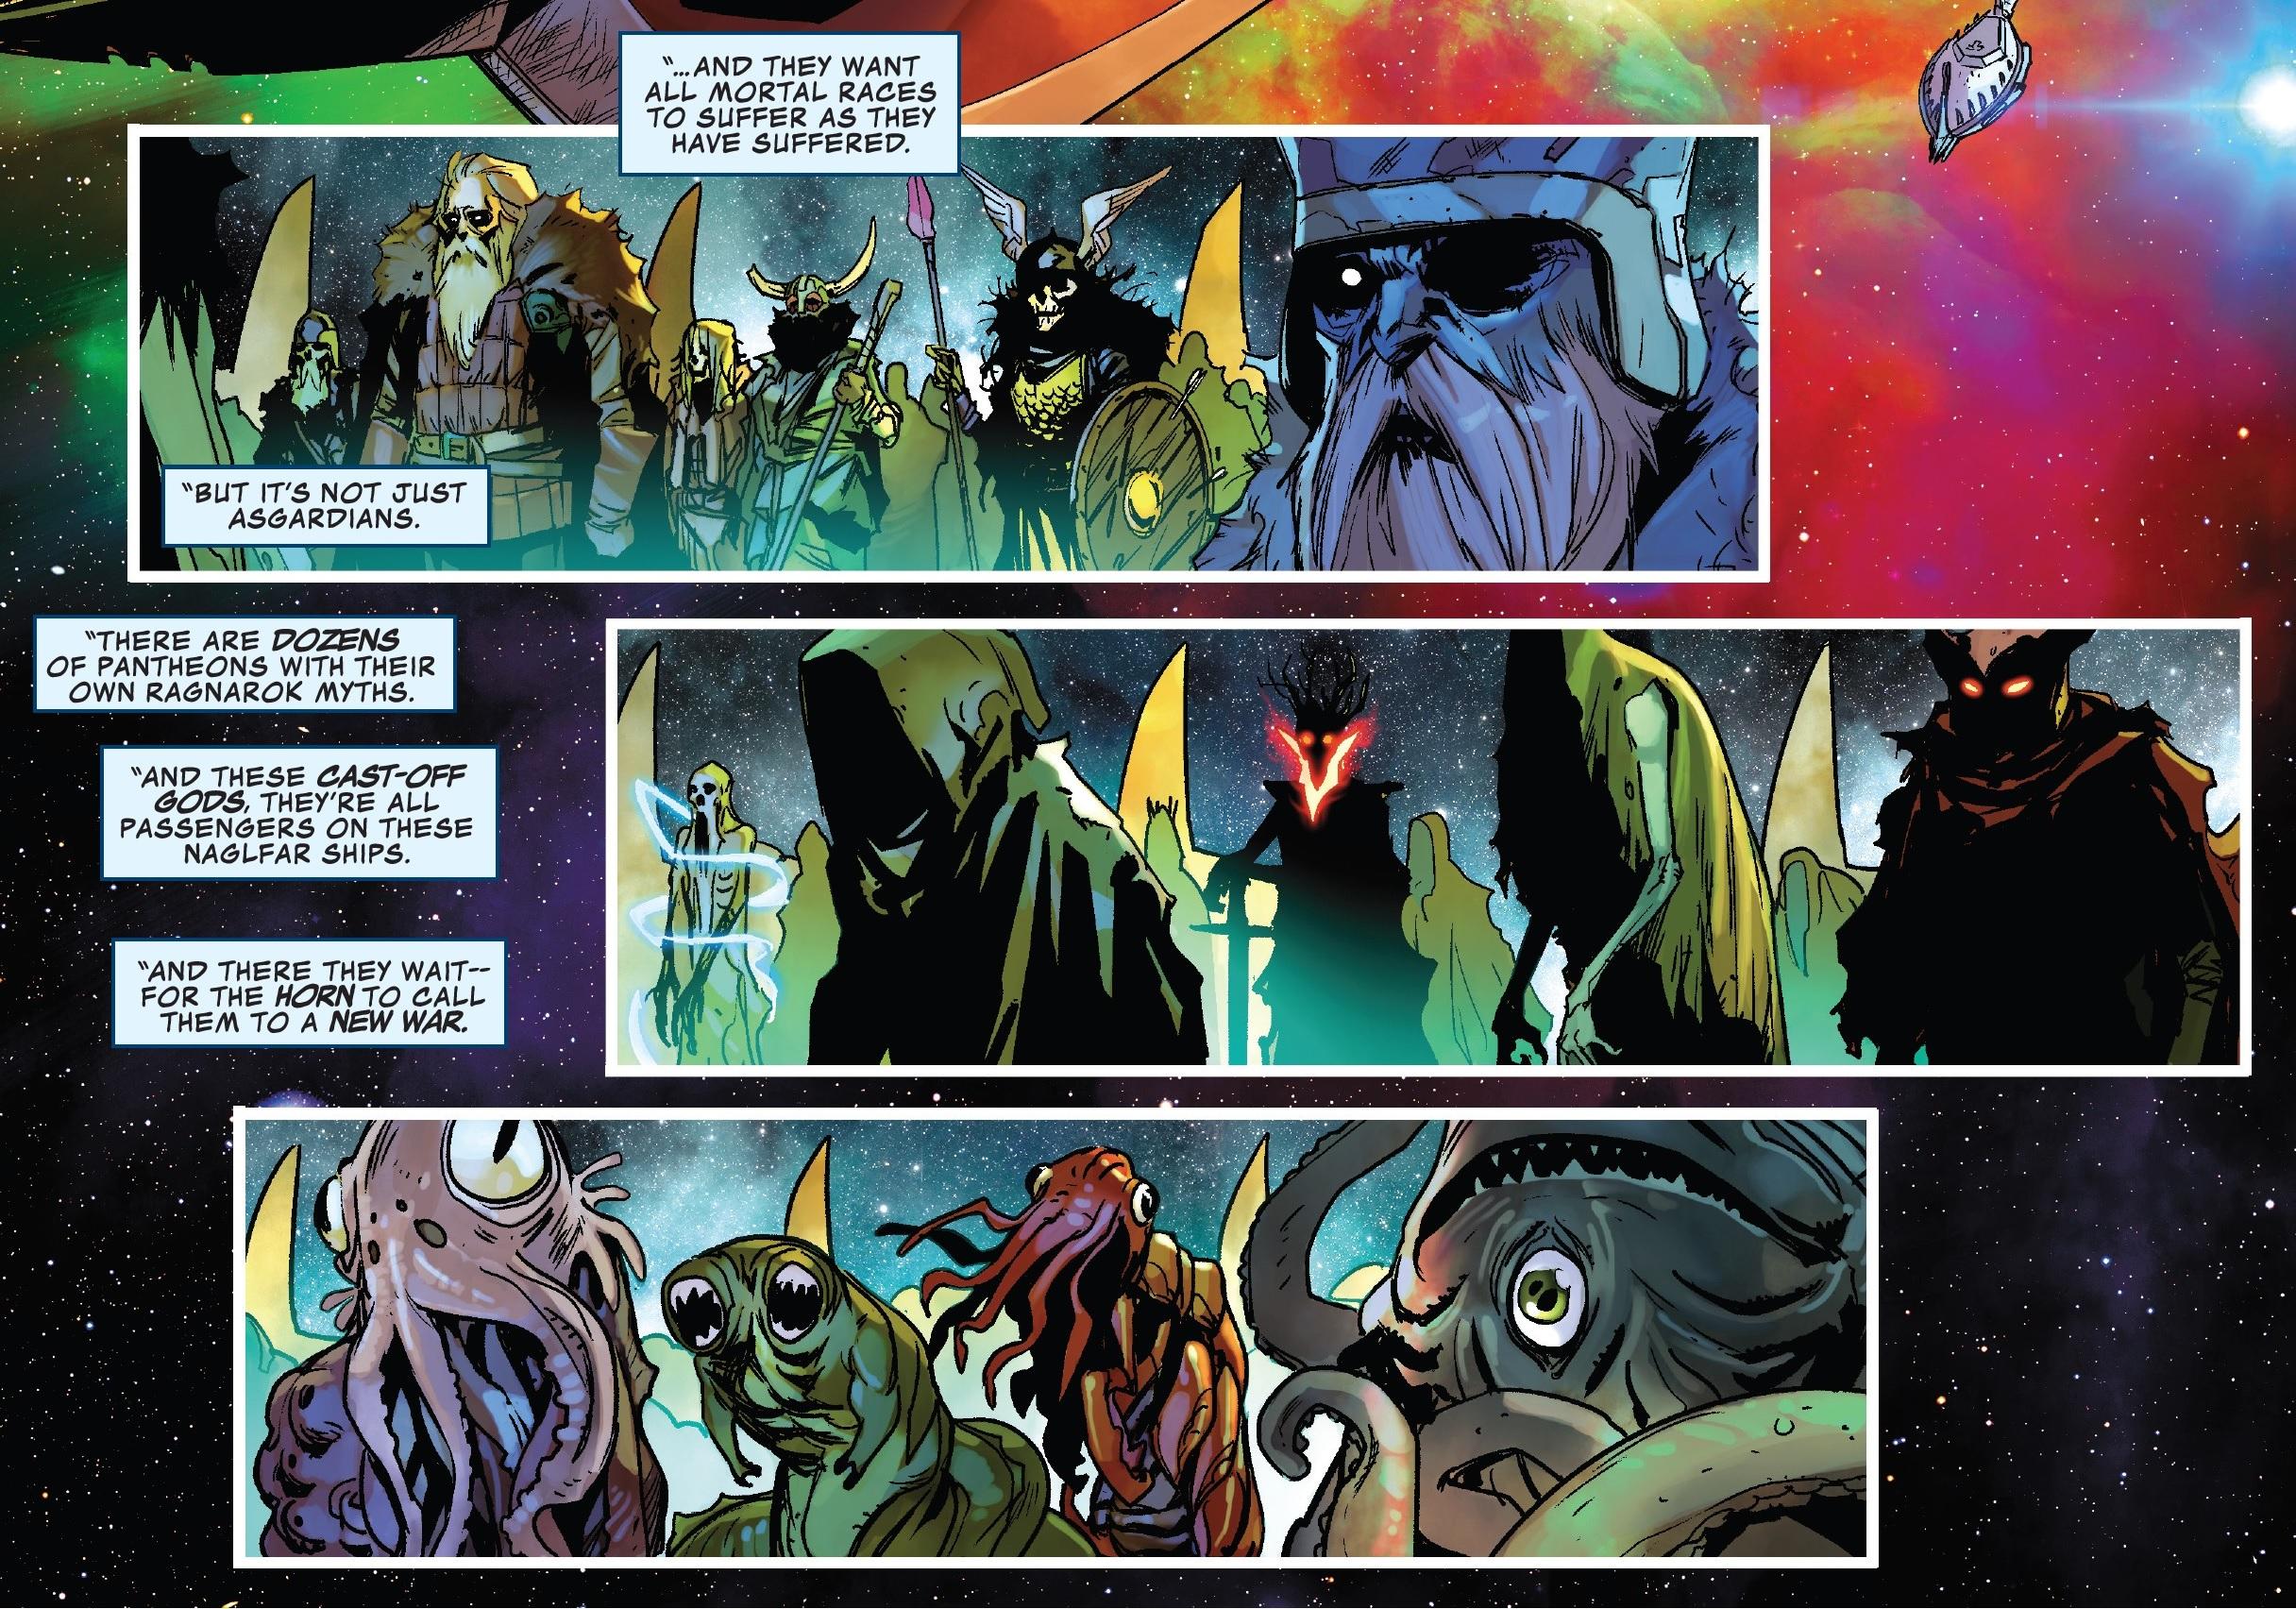 Naglfar Armada (Earth-616)/Gallery